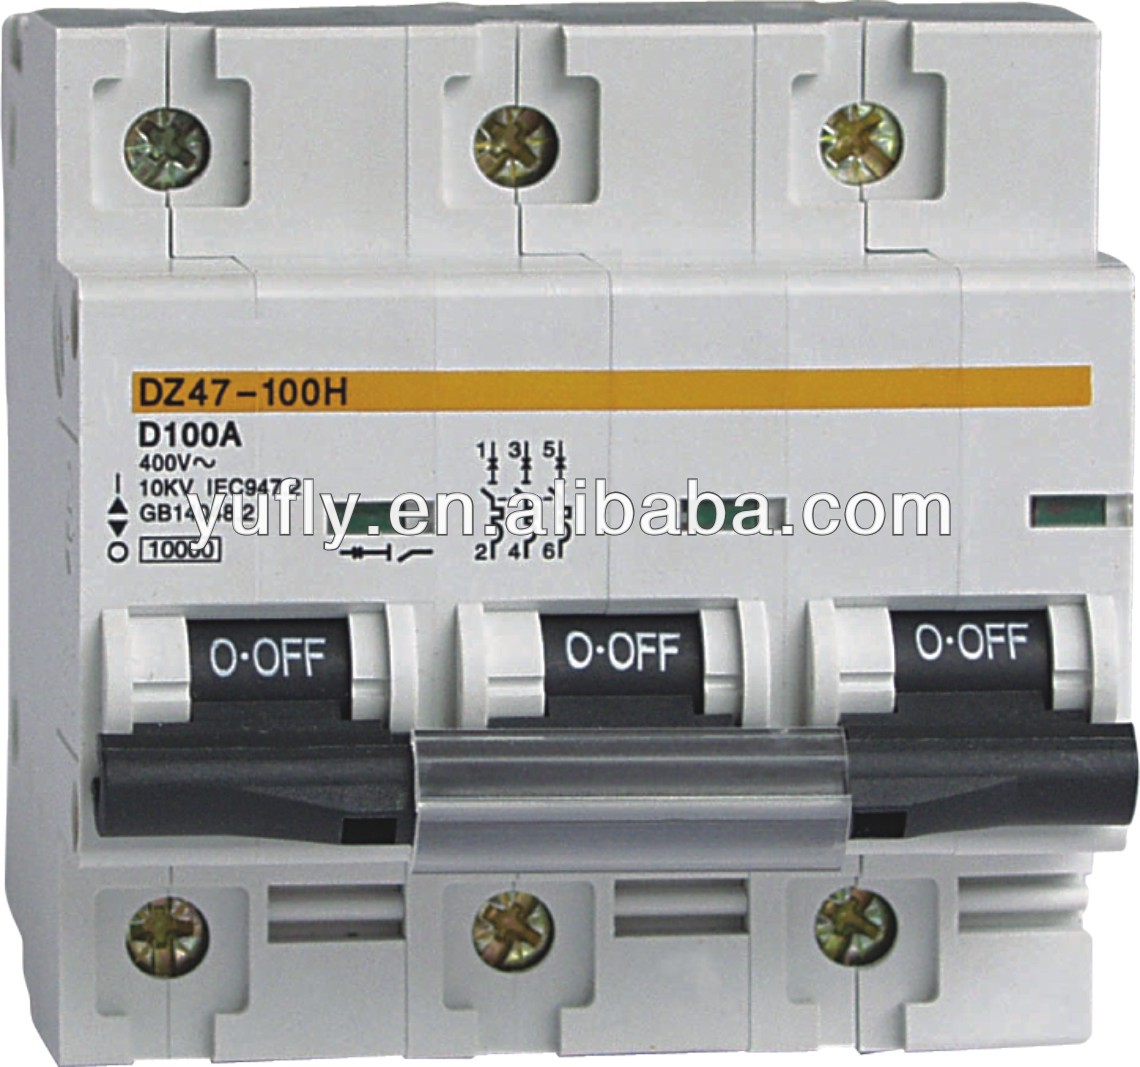 Circuit Breaker House - Merzie.net